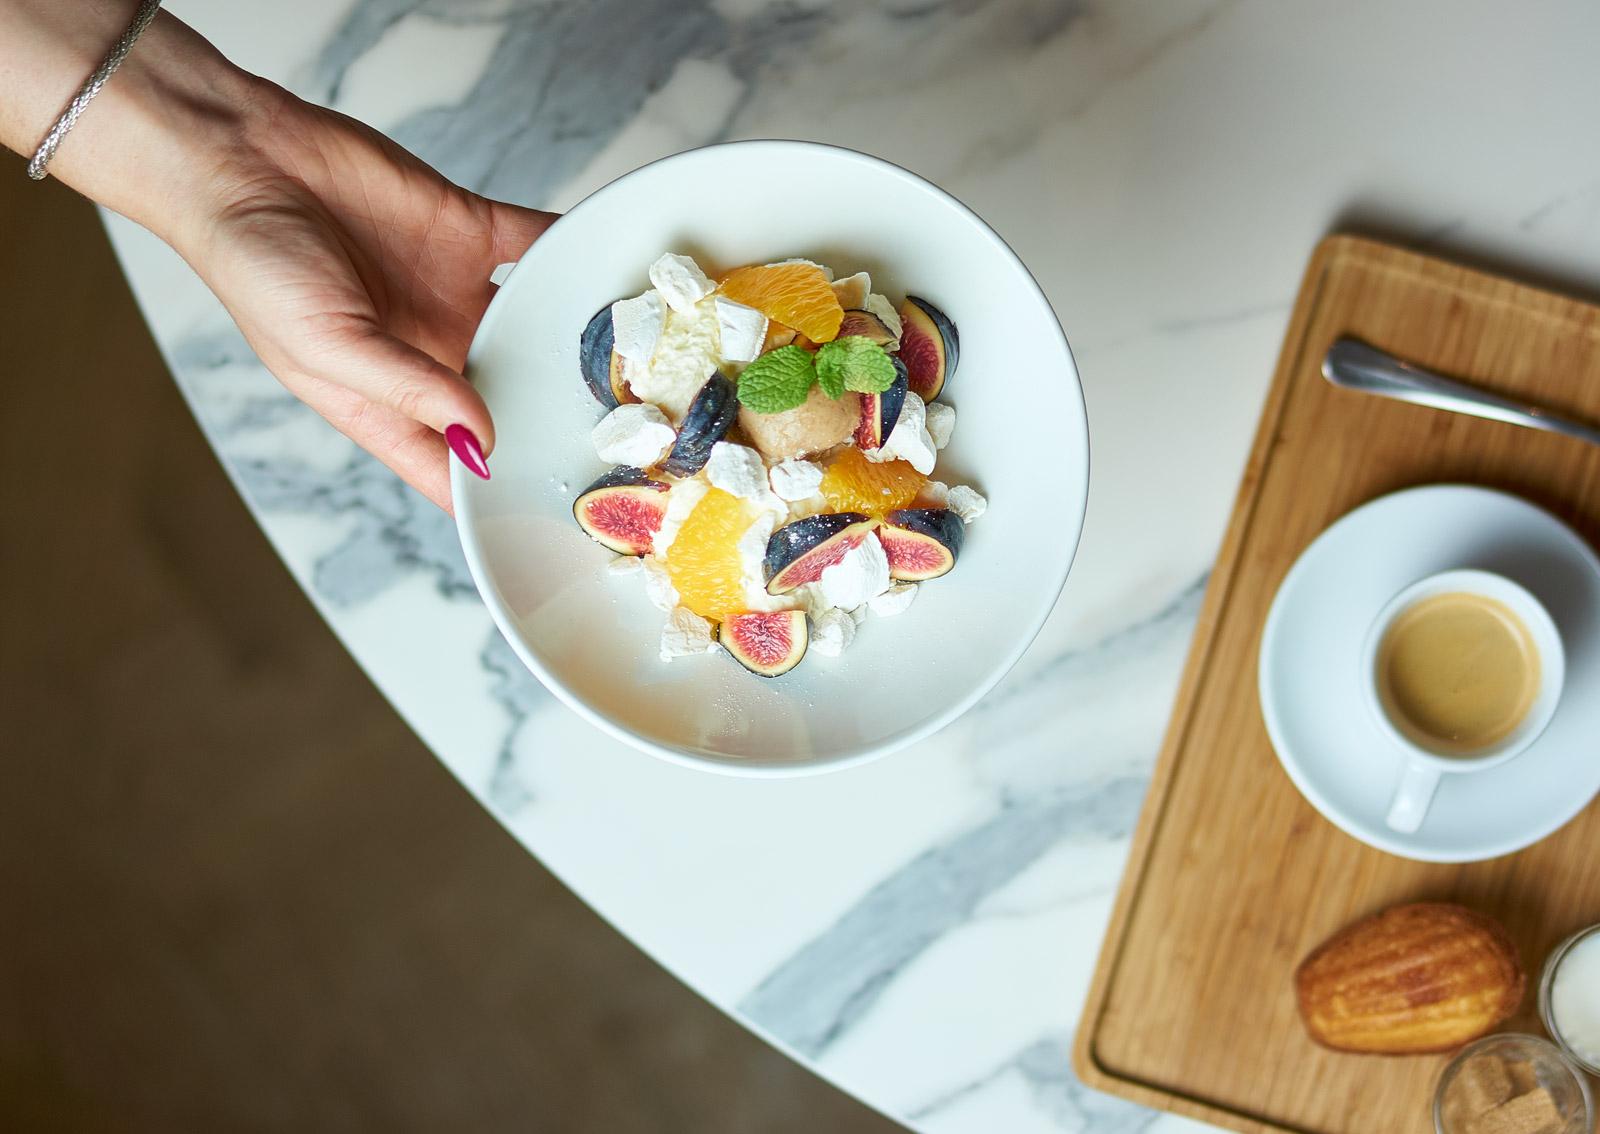 art-cullinaire-tournai-photo-lunch-repas-bio-photographe-2